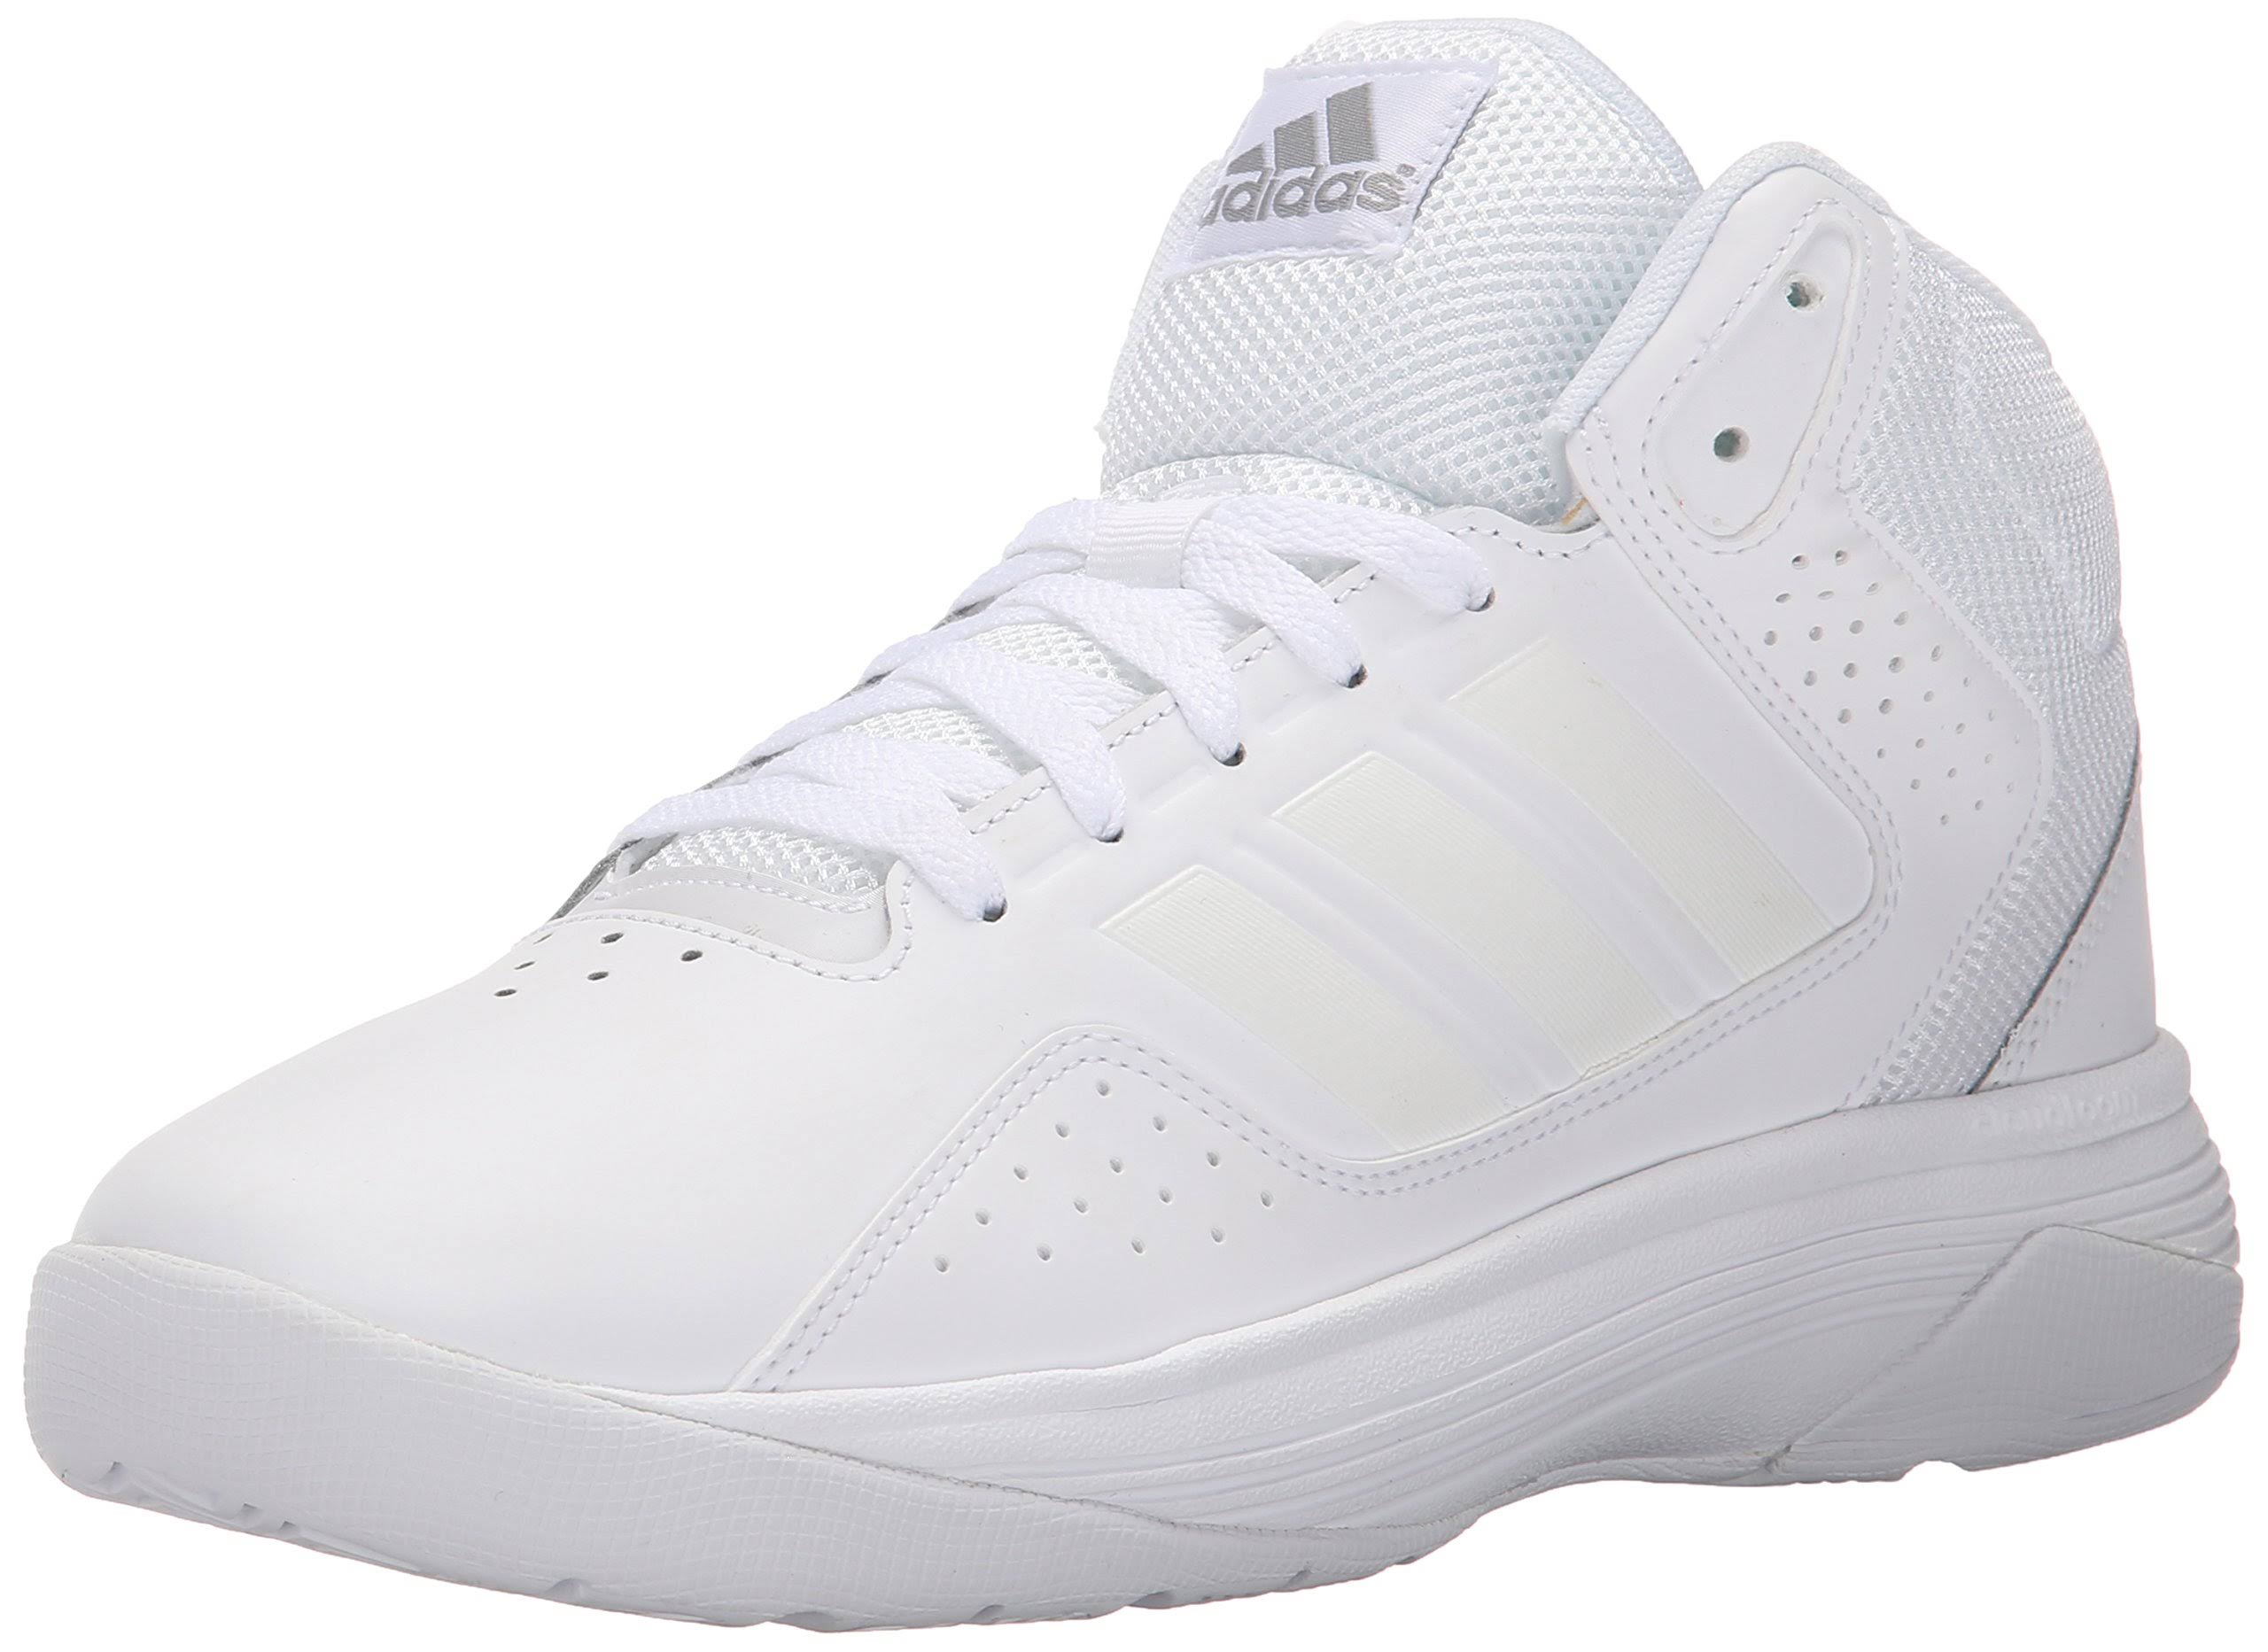 Hombre Performance Baloncesto Ilation Adidas Cloudfoam Para Mid De Zapatillas Wng6RH4xXF